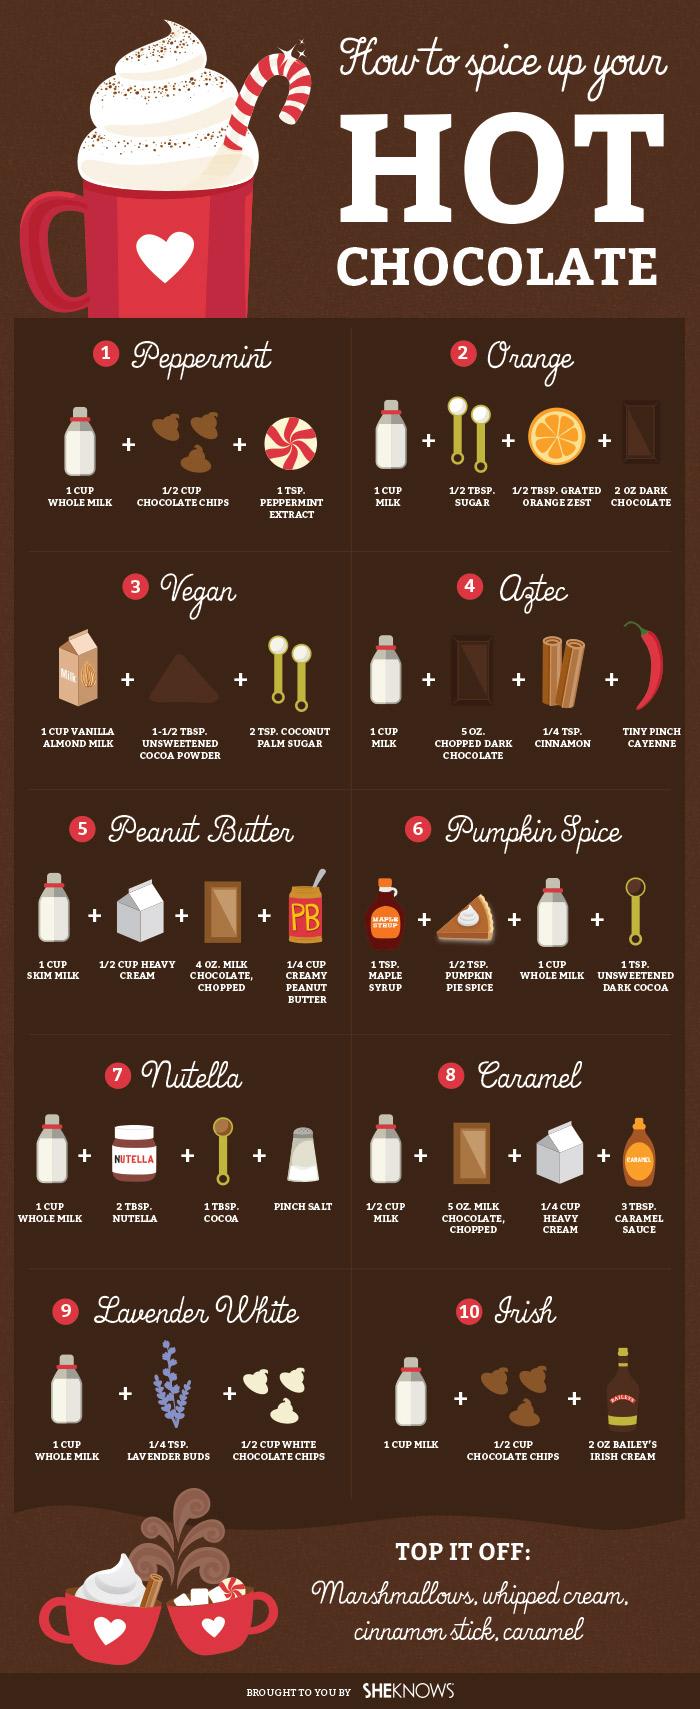 hotchocolateguide